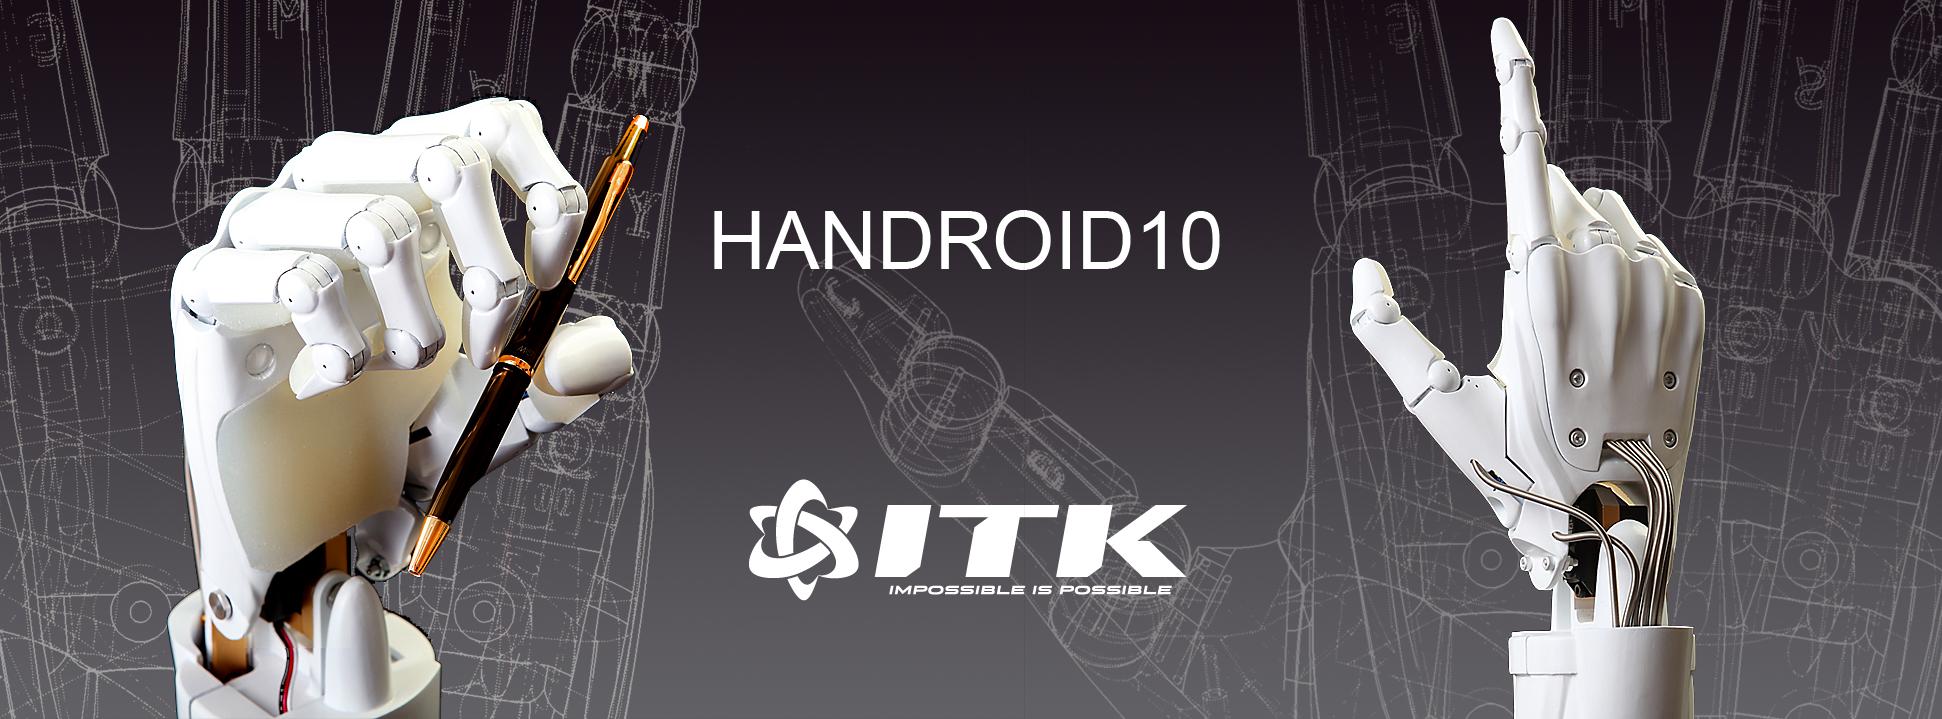 handroid10_top